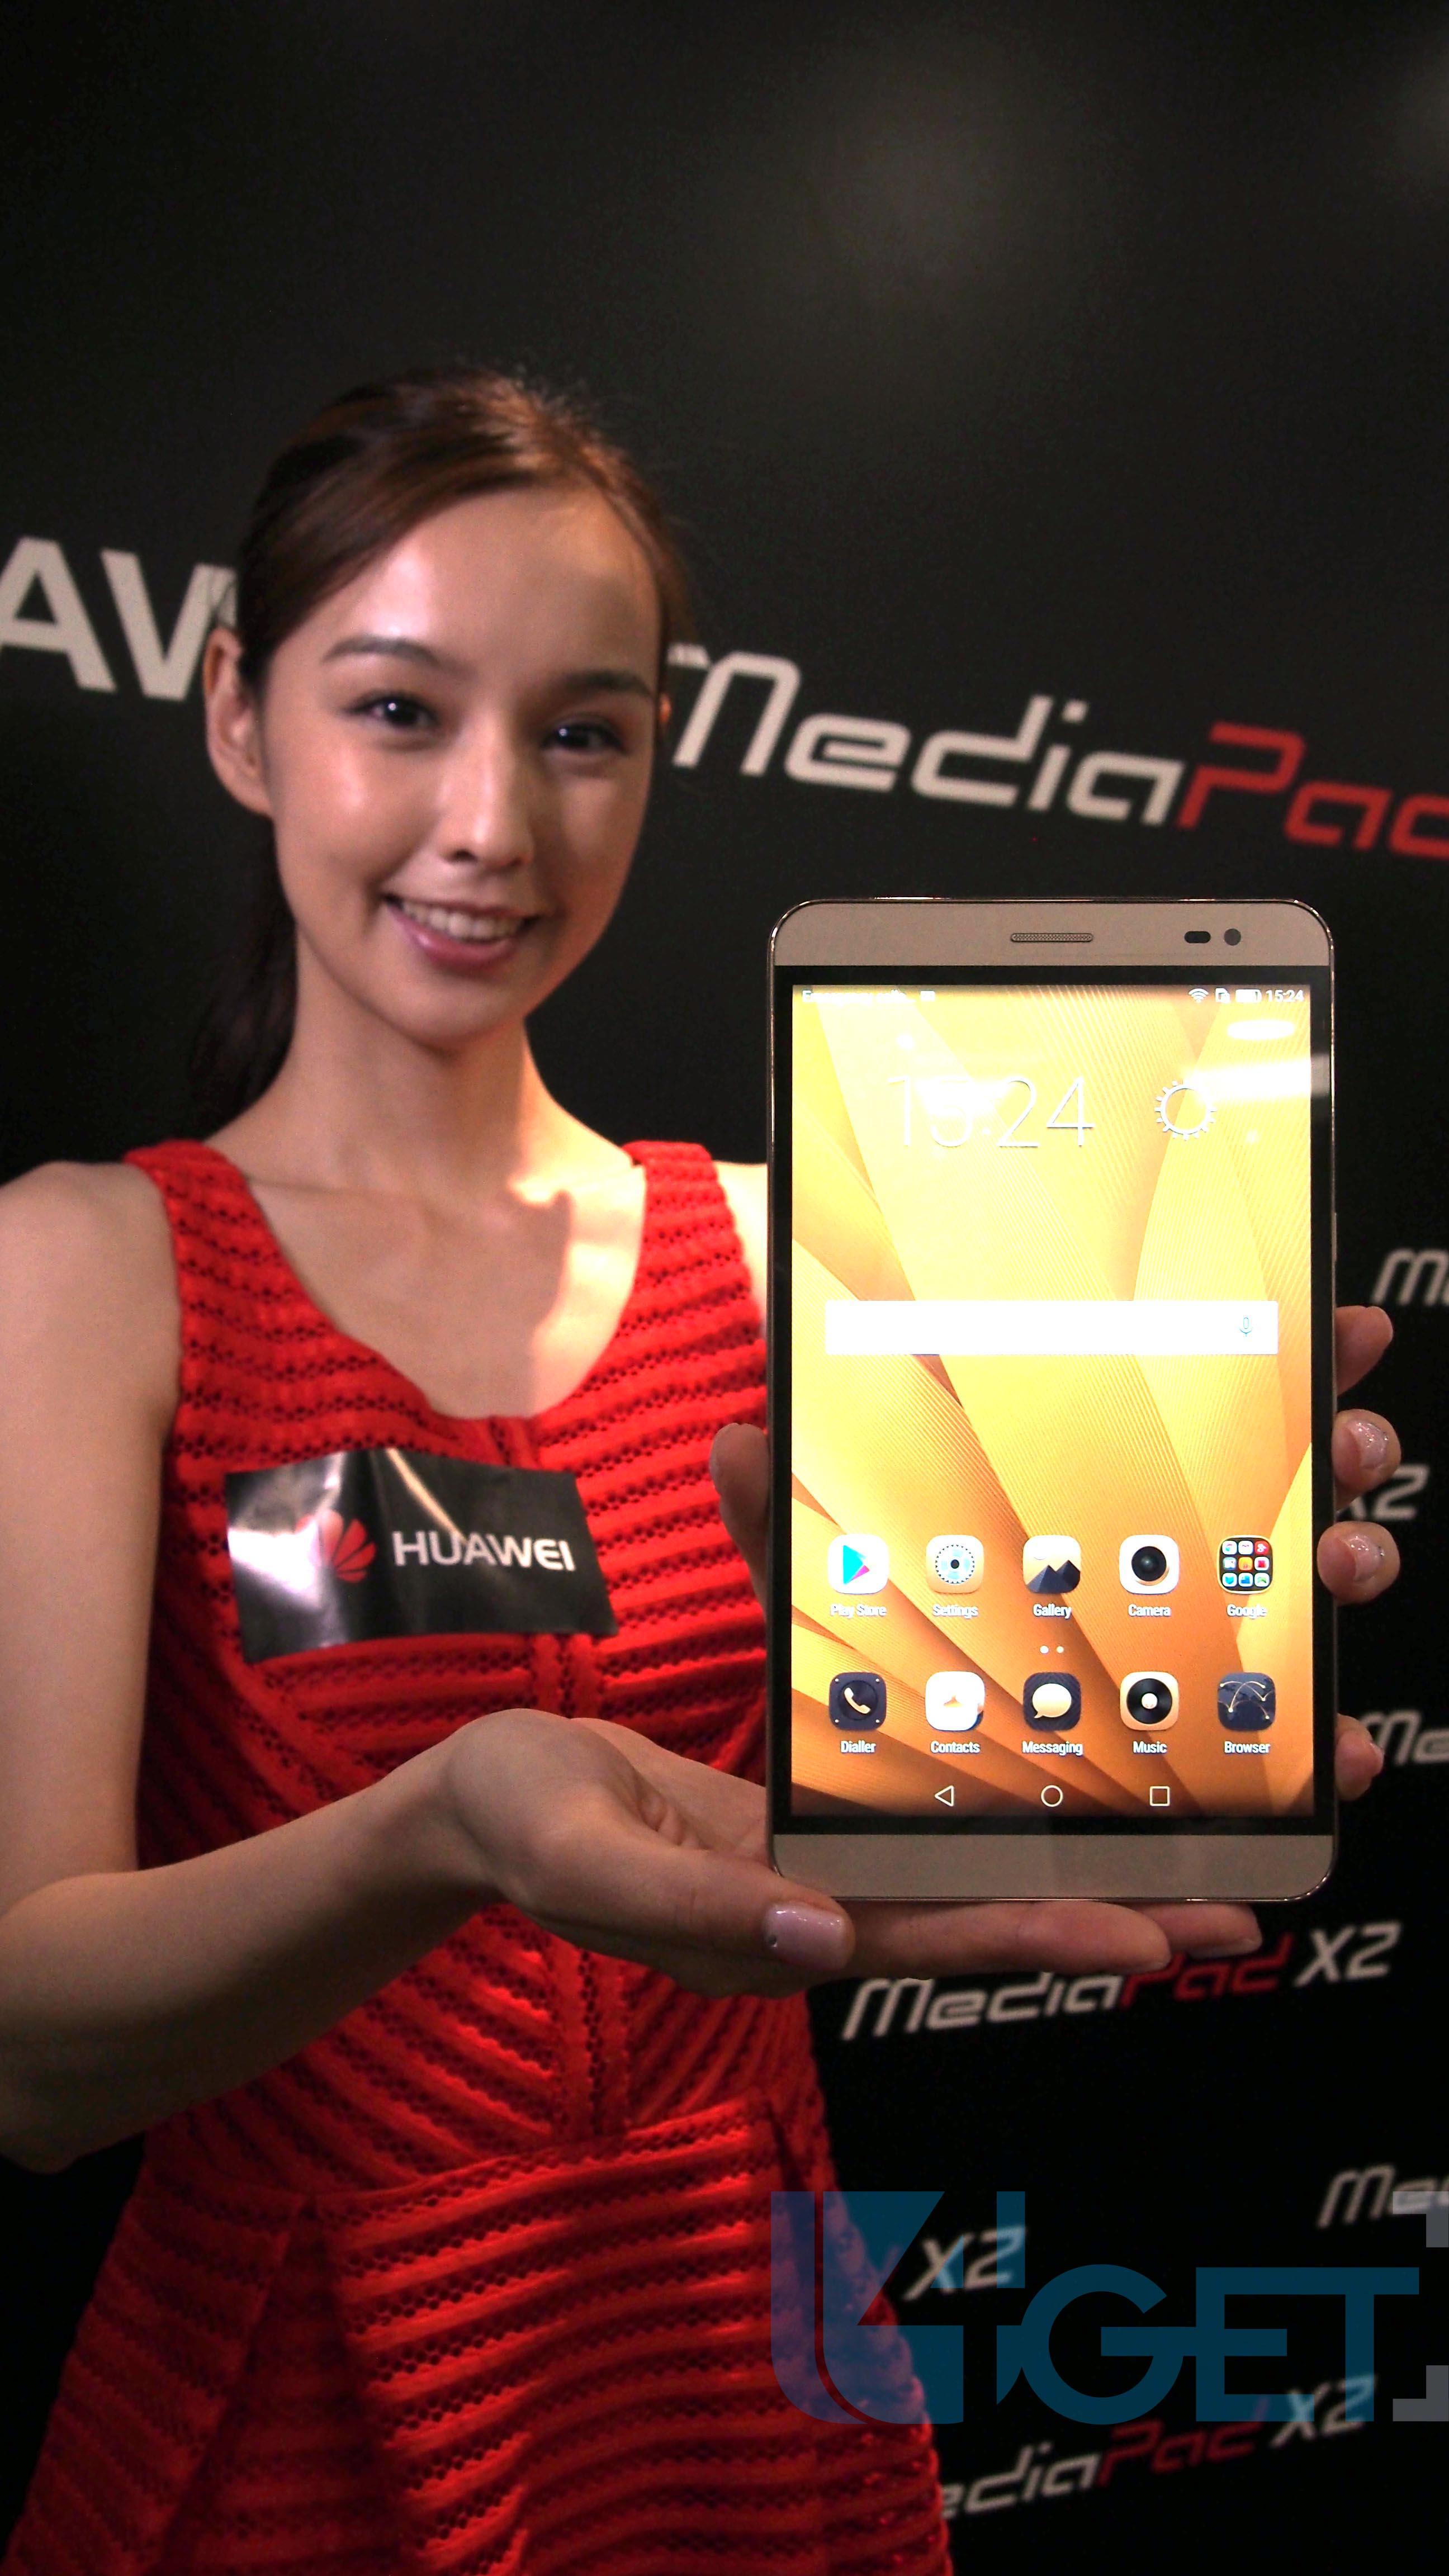 Huawei MediaPad X2 初試  「屏幕好靚,但部機實在太大」